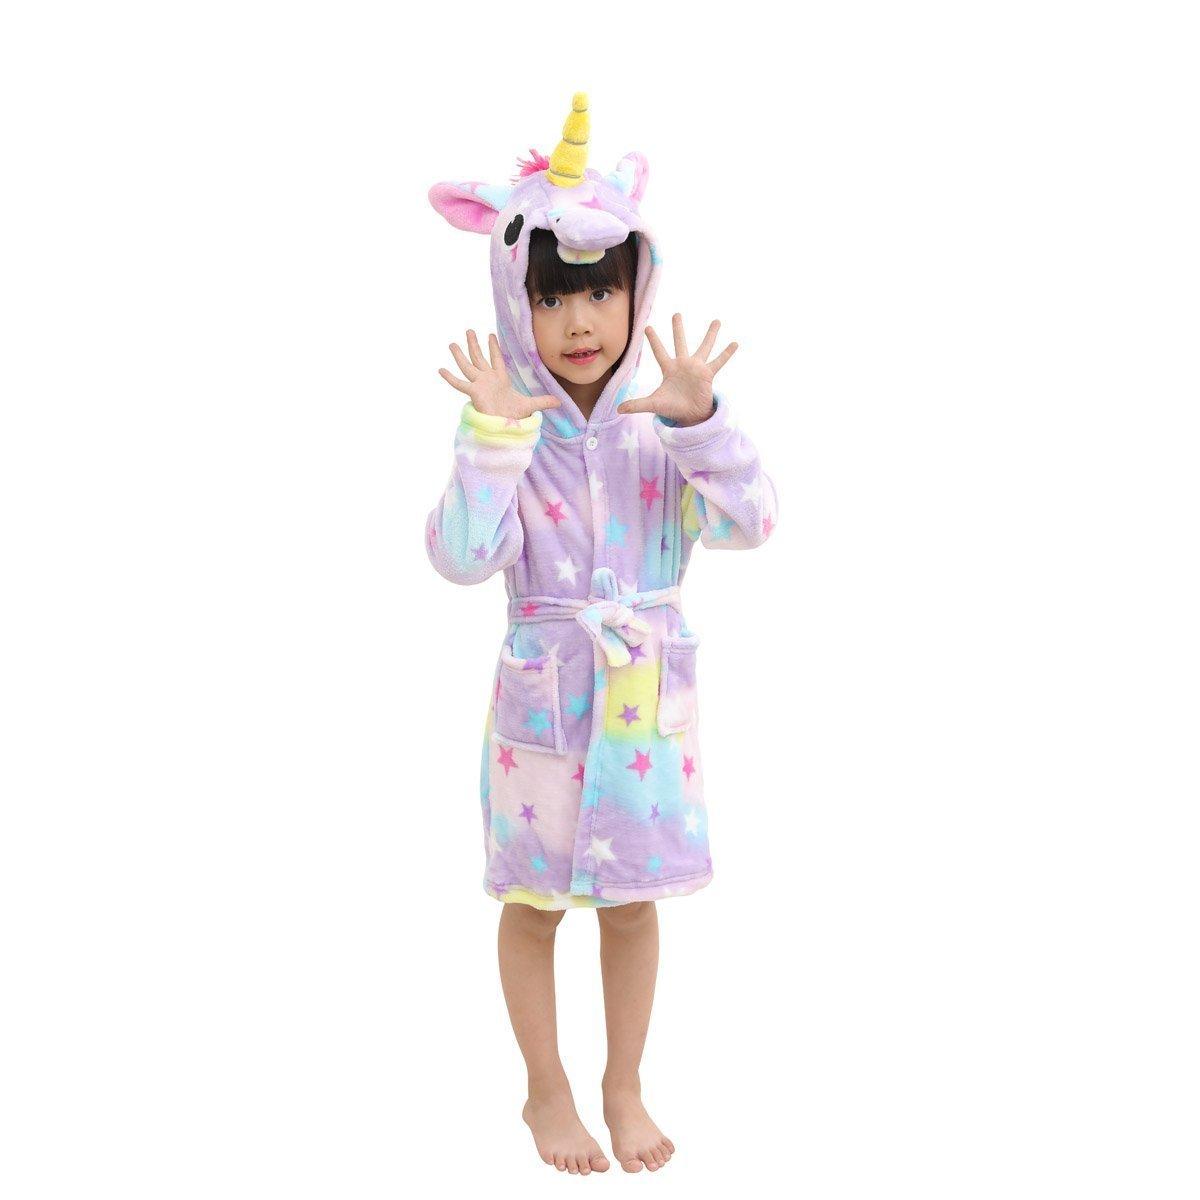 Lantop Kids Soft Bathrobe Comfy Unicorn Flannel Robe Unisex Hooded Gift All Seasons Sleepwear